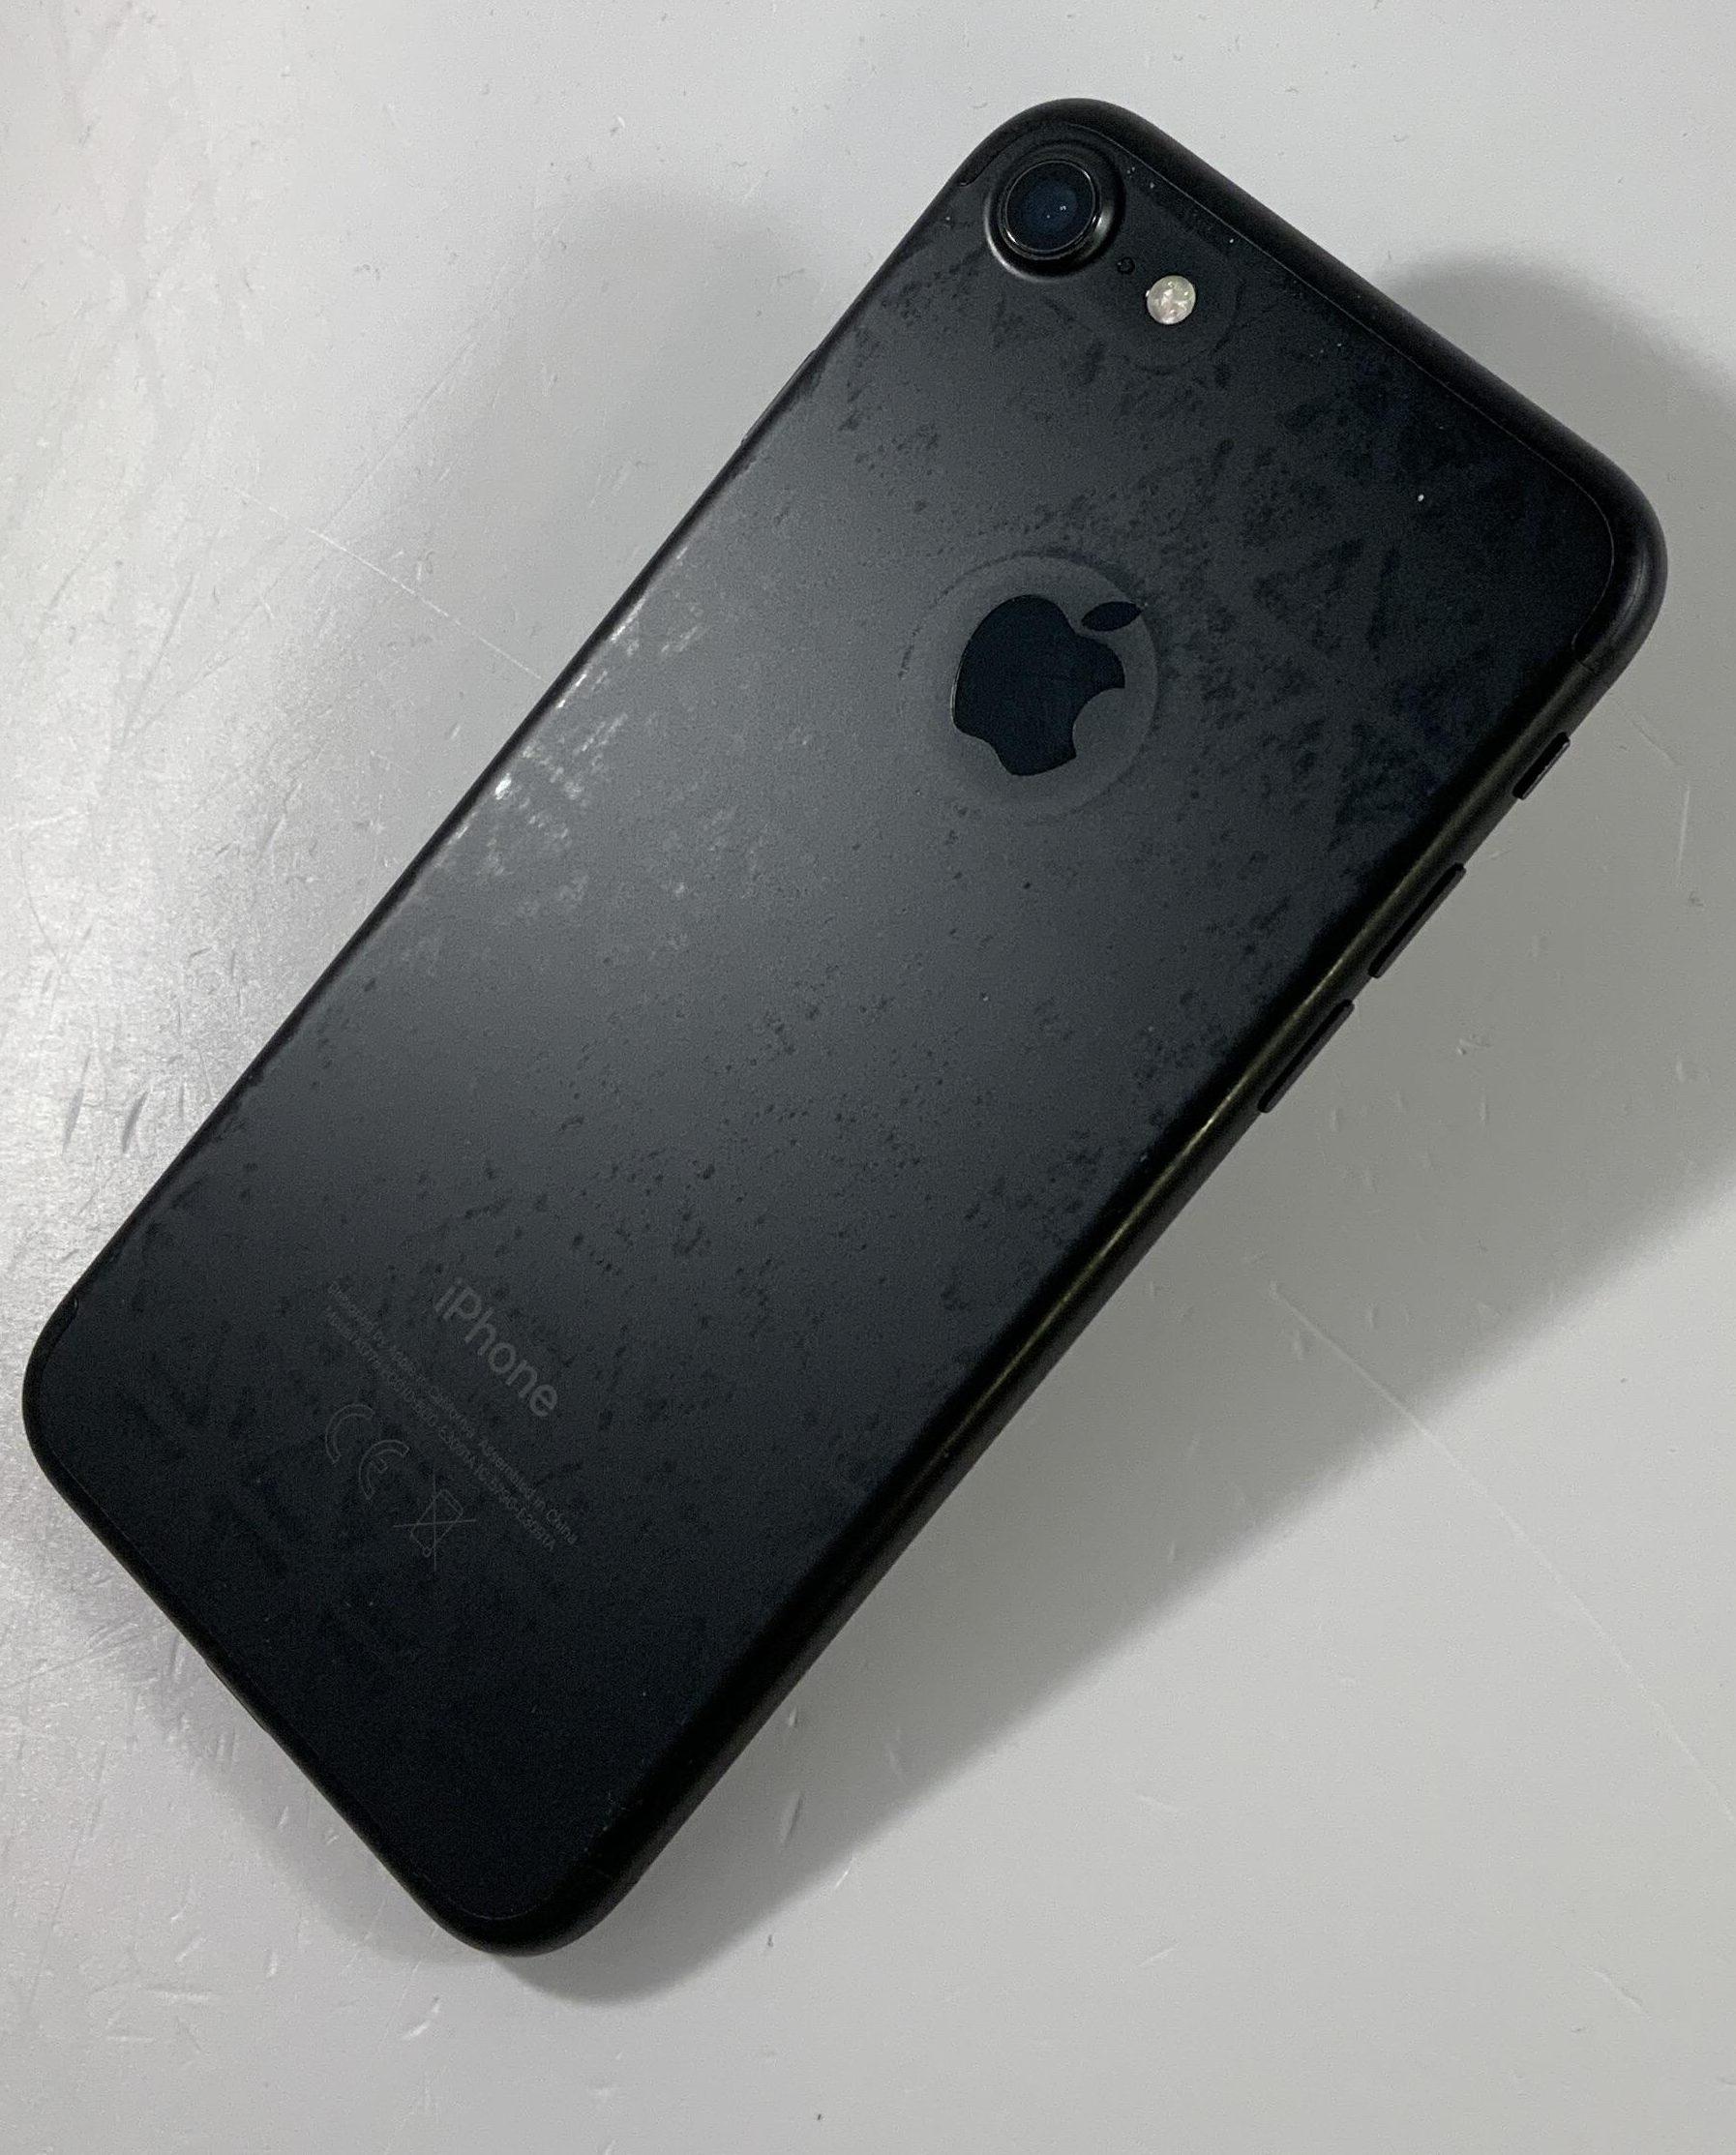 iPhone 7 32GB, 32GB, Black, Afbeelding 3